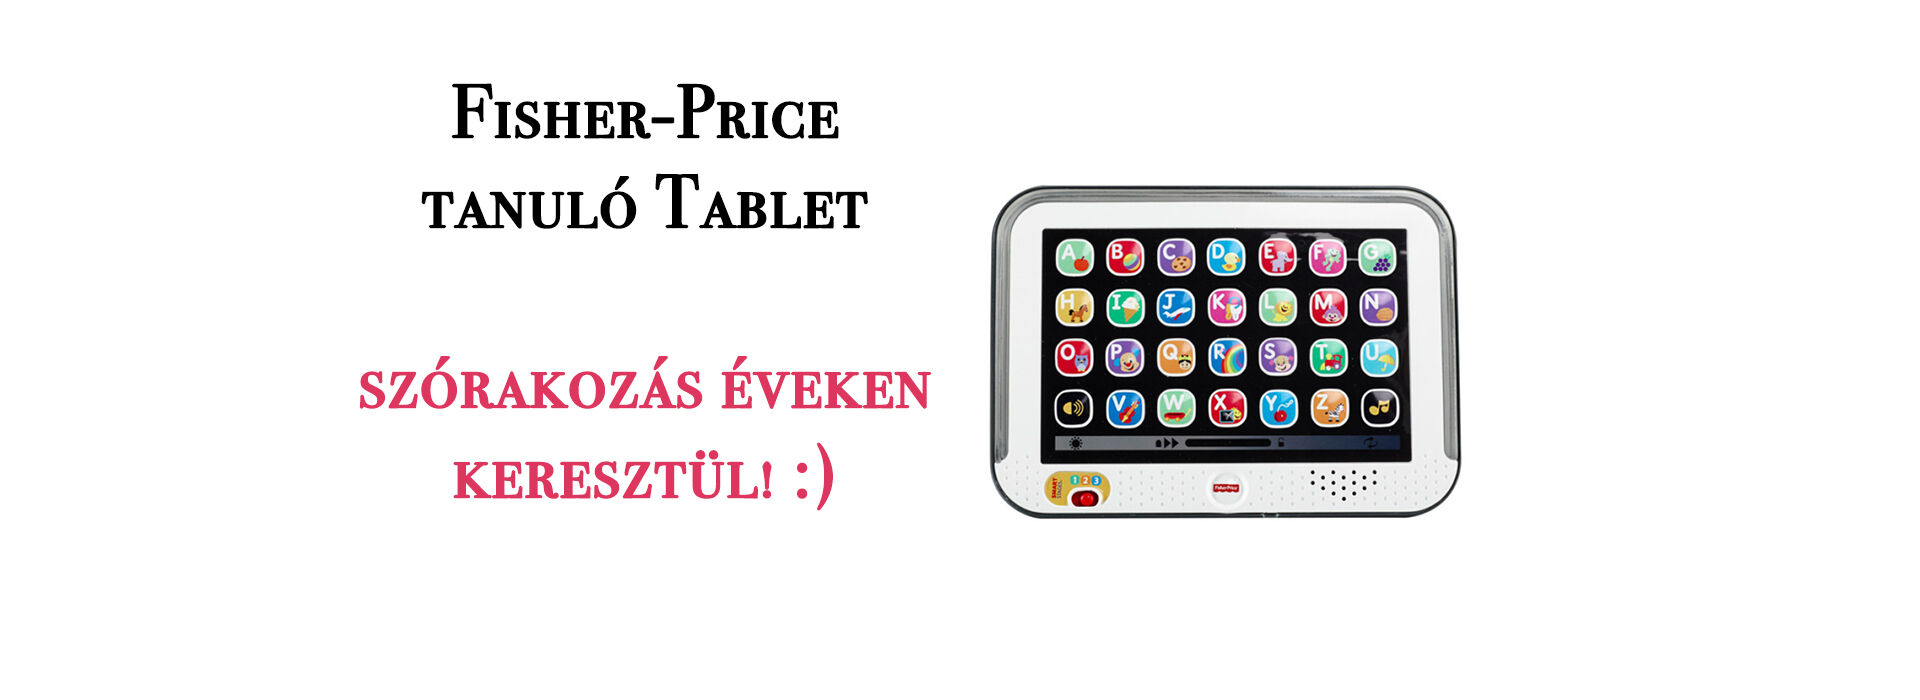 Tanuló Tablet